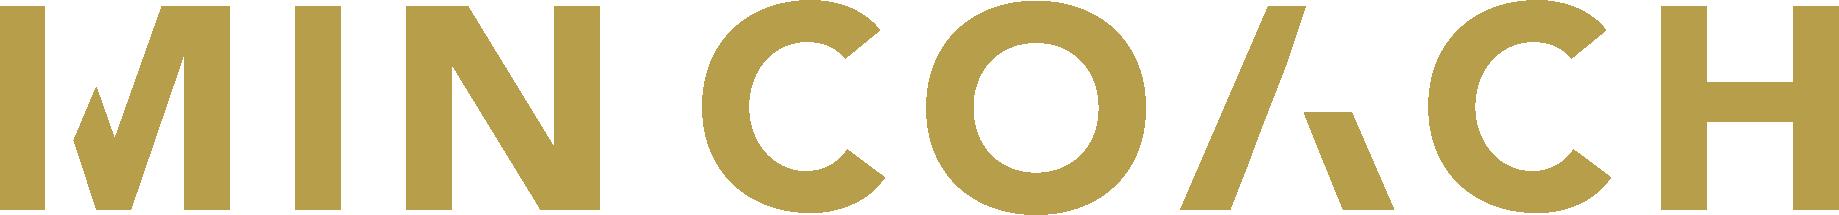 MIN COACH logo